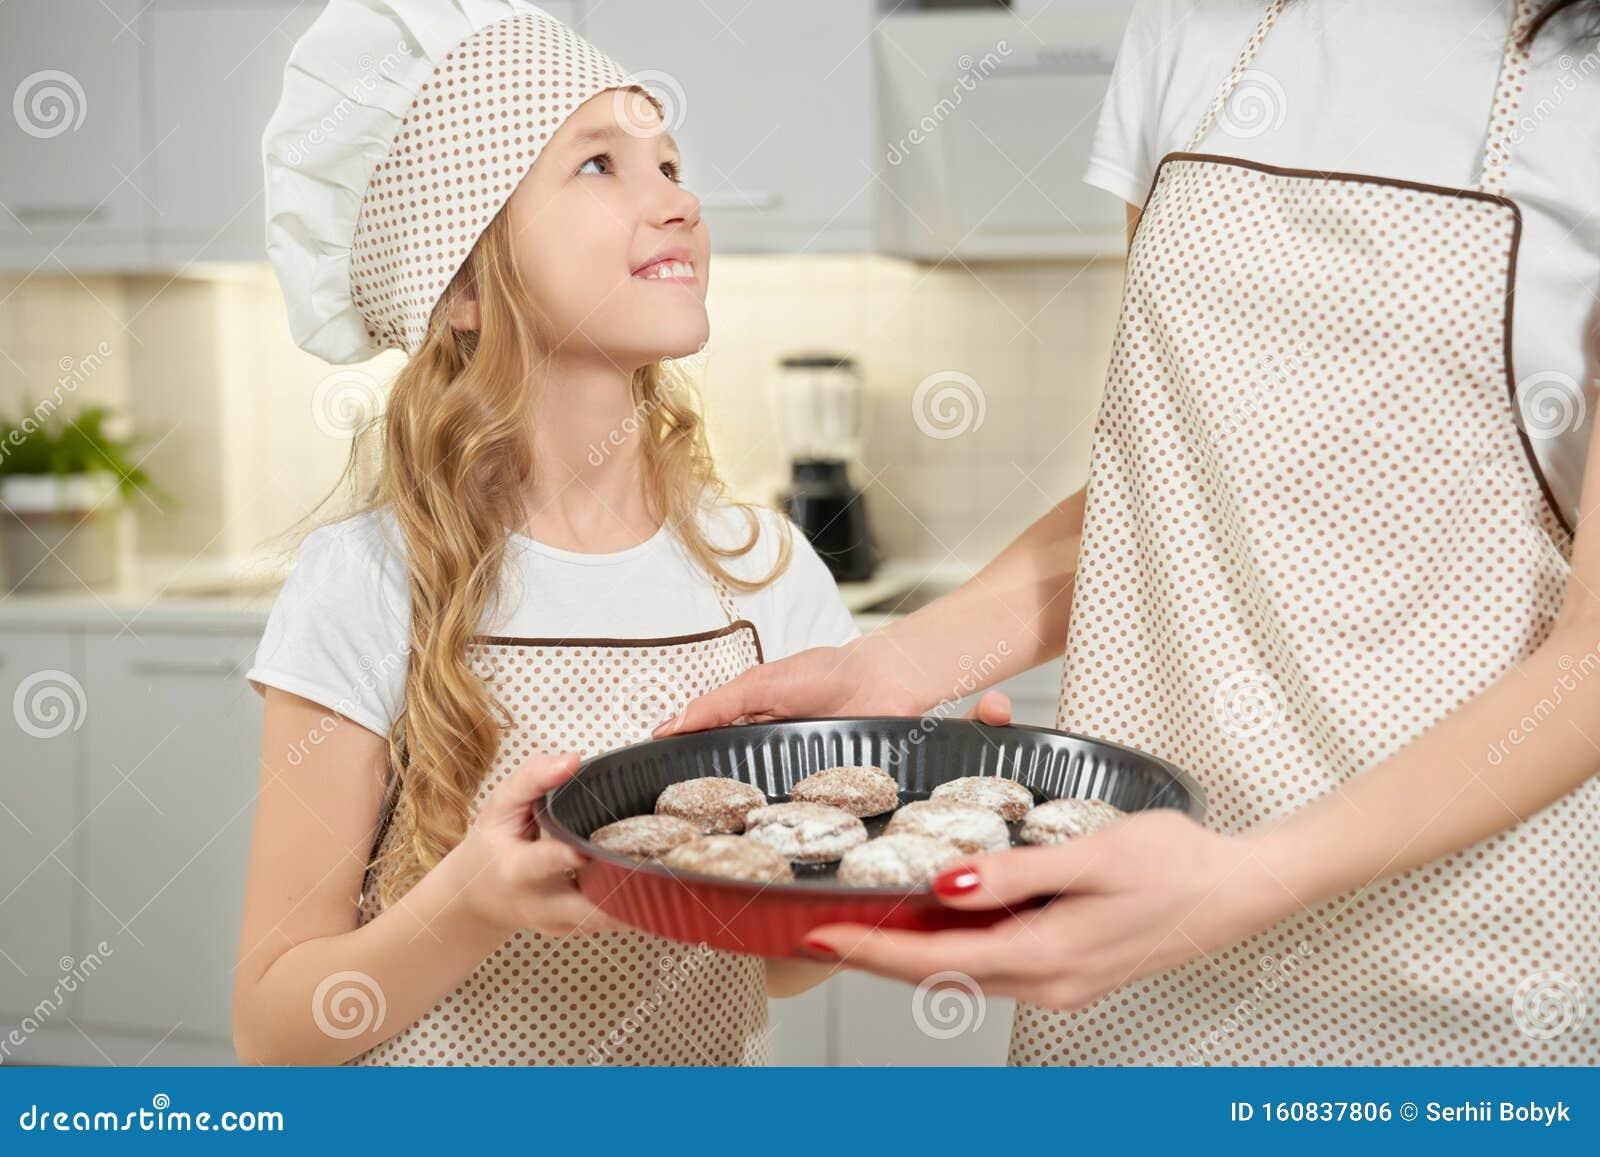 Girl/'s Cupcake Baking with Dad Apron